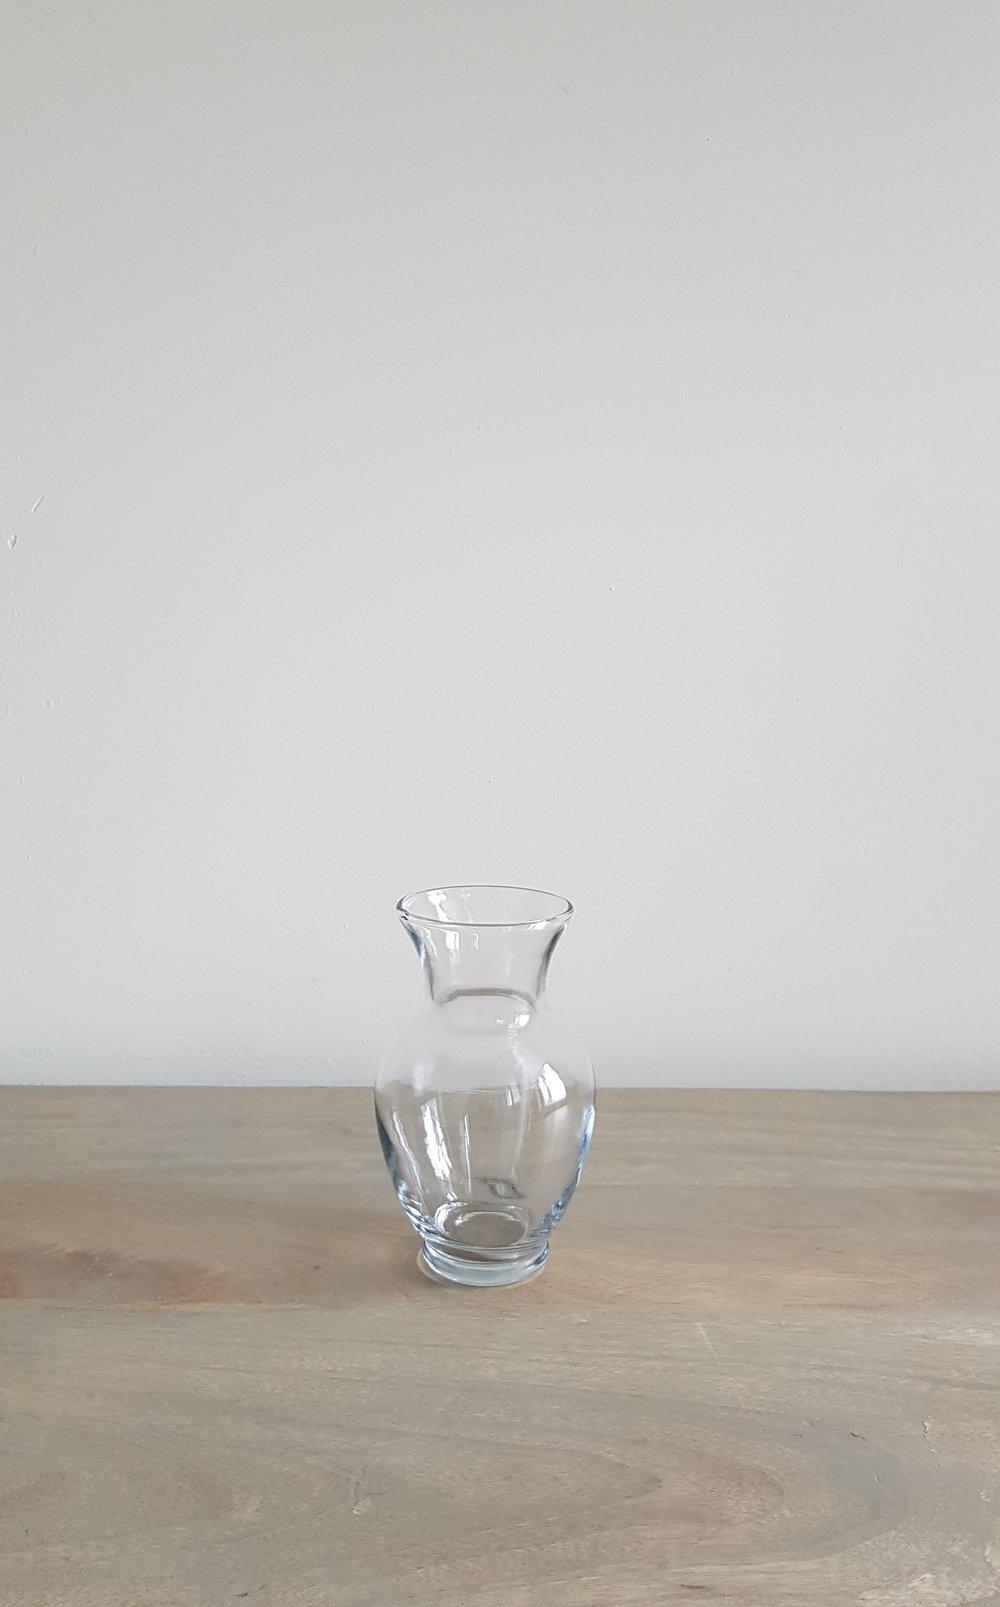 Garden Bud Vase - $1.50 each   Qty: 65